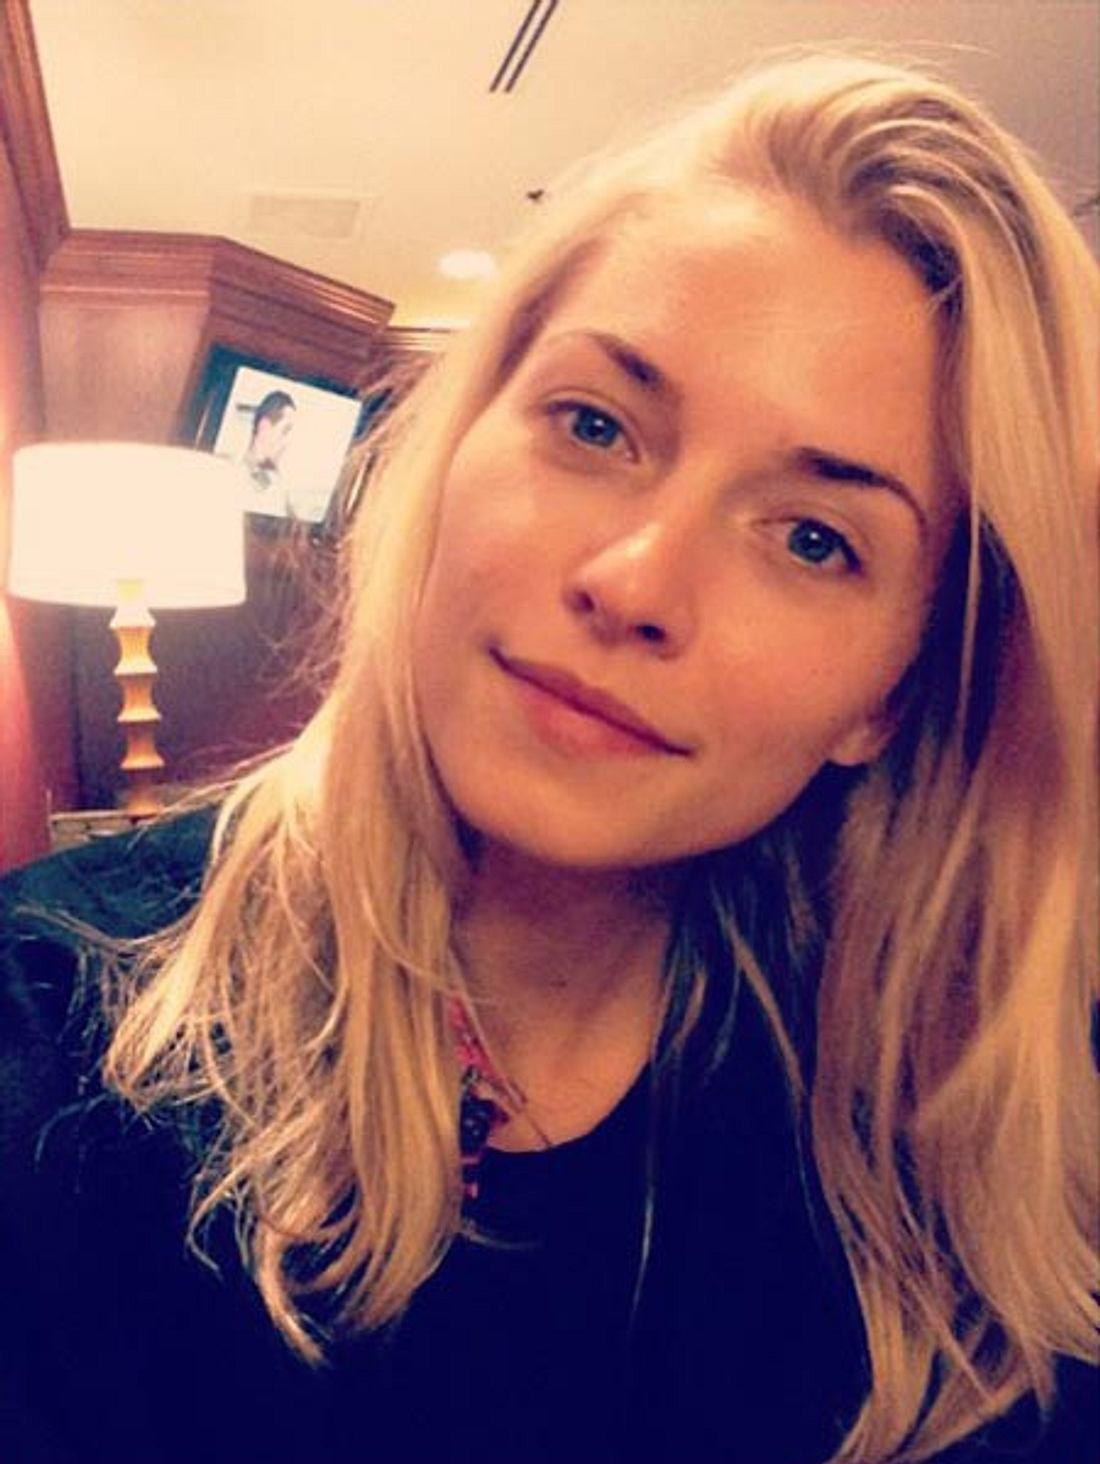 Lena Gercke ist auch ungeschminkt verblüffend schön